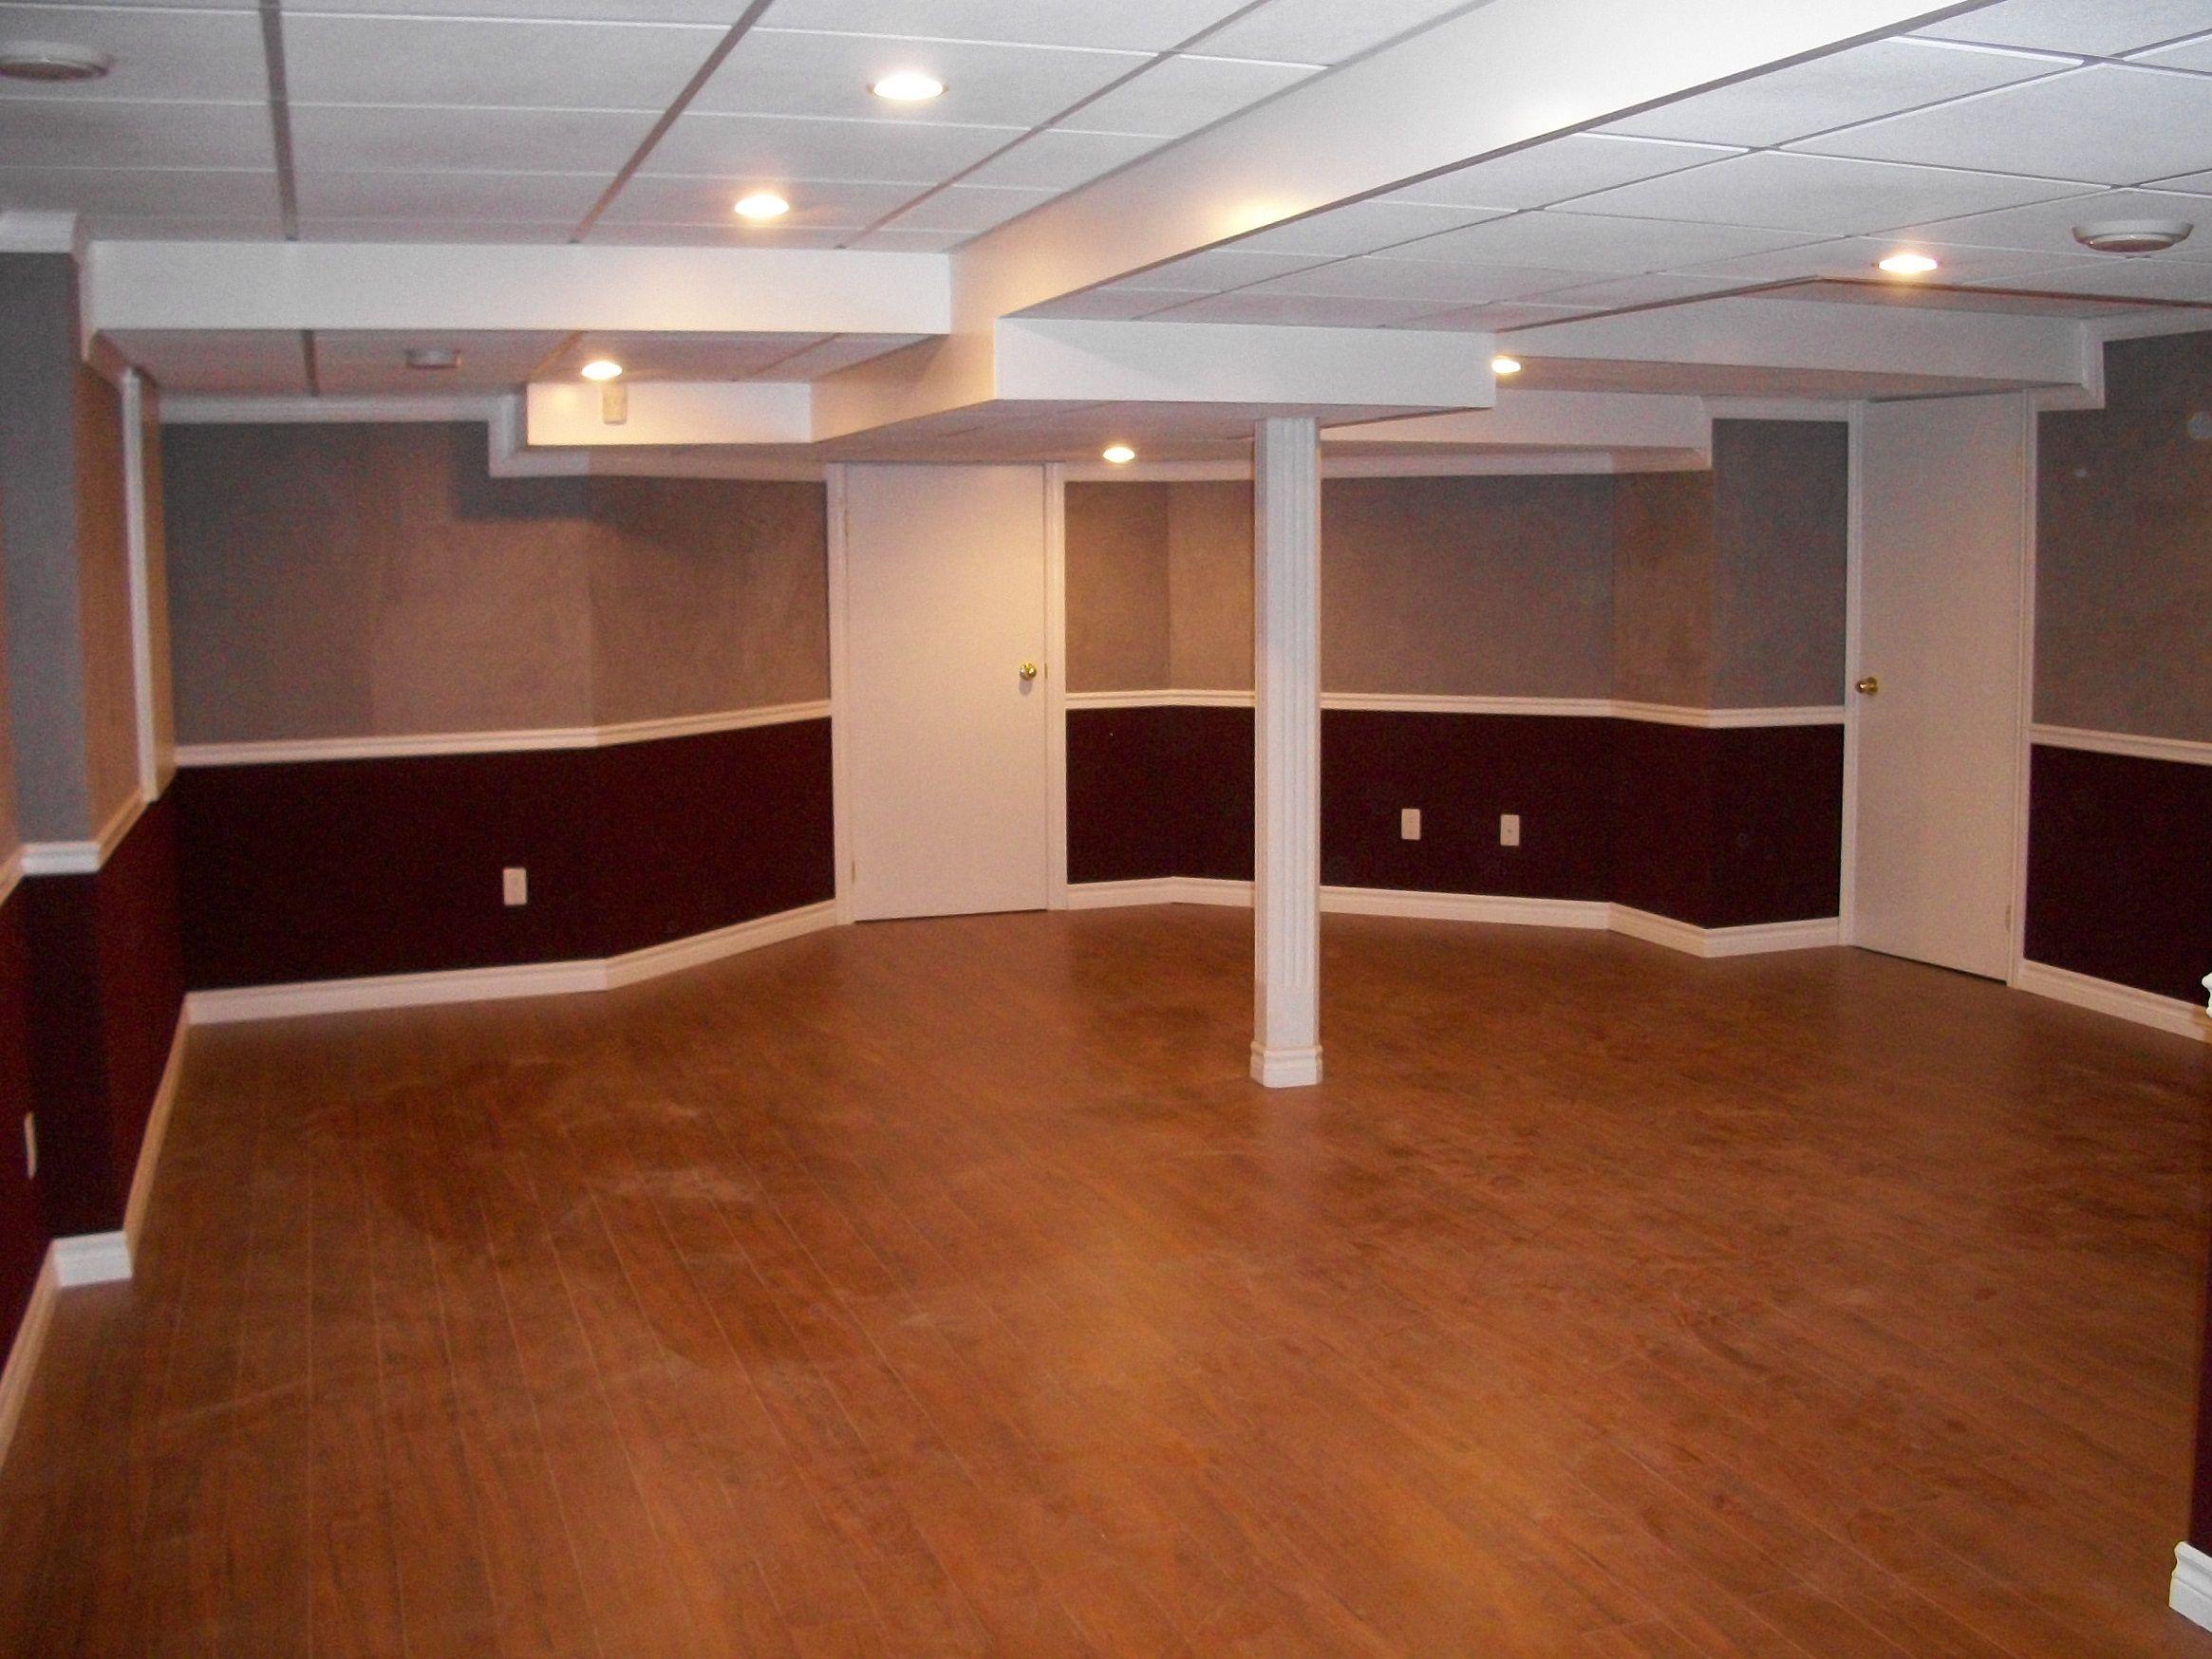 Basement: Diy Waterproof Basement Wall Panels And Removable Basement Wall  Panels With Insulated Basement Wall